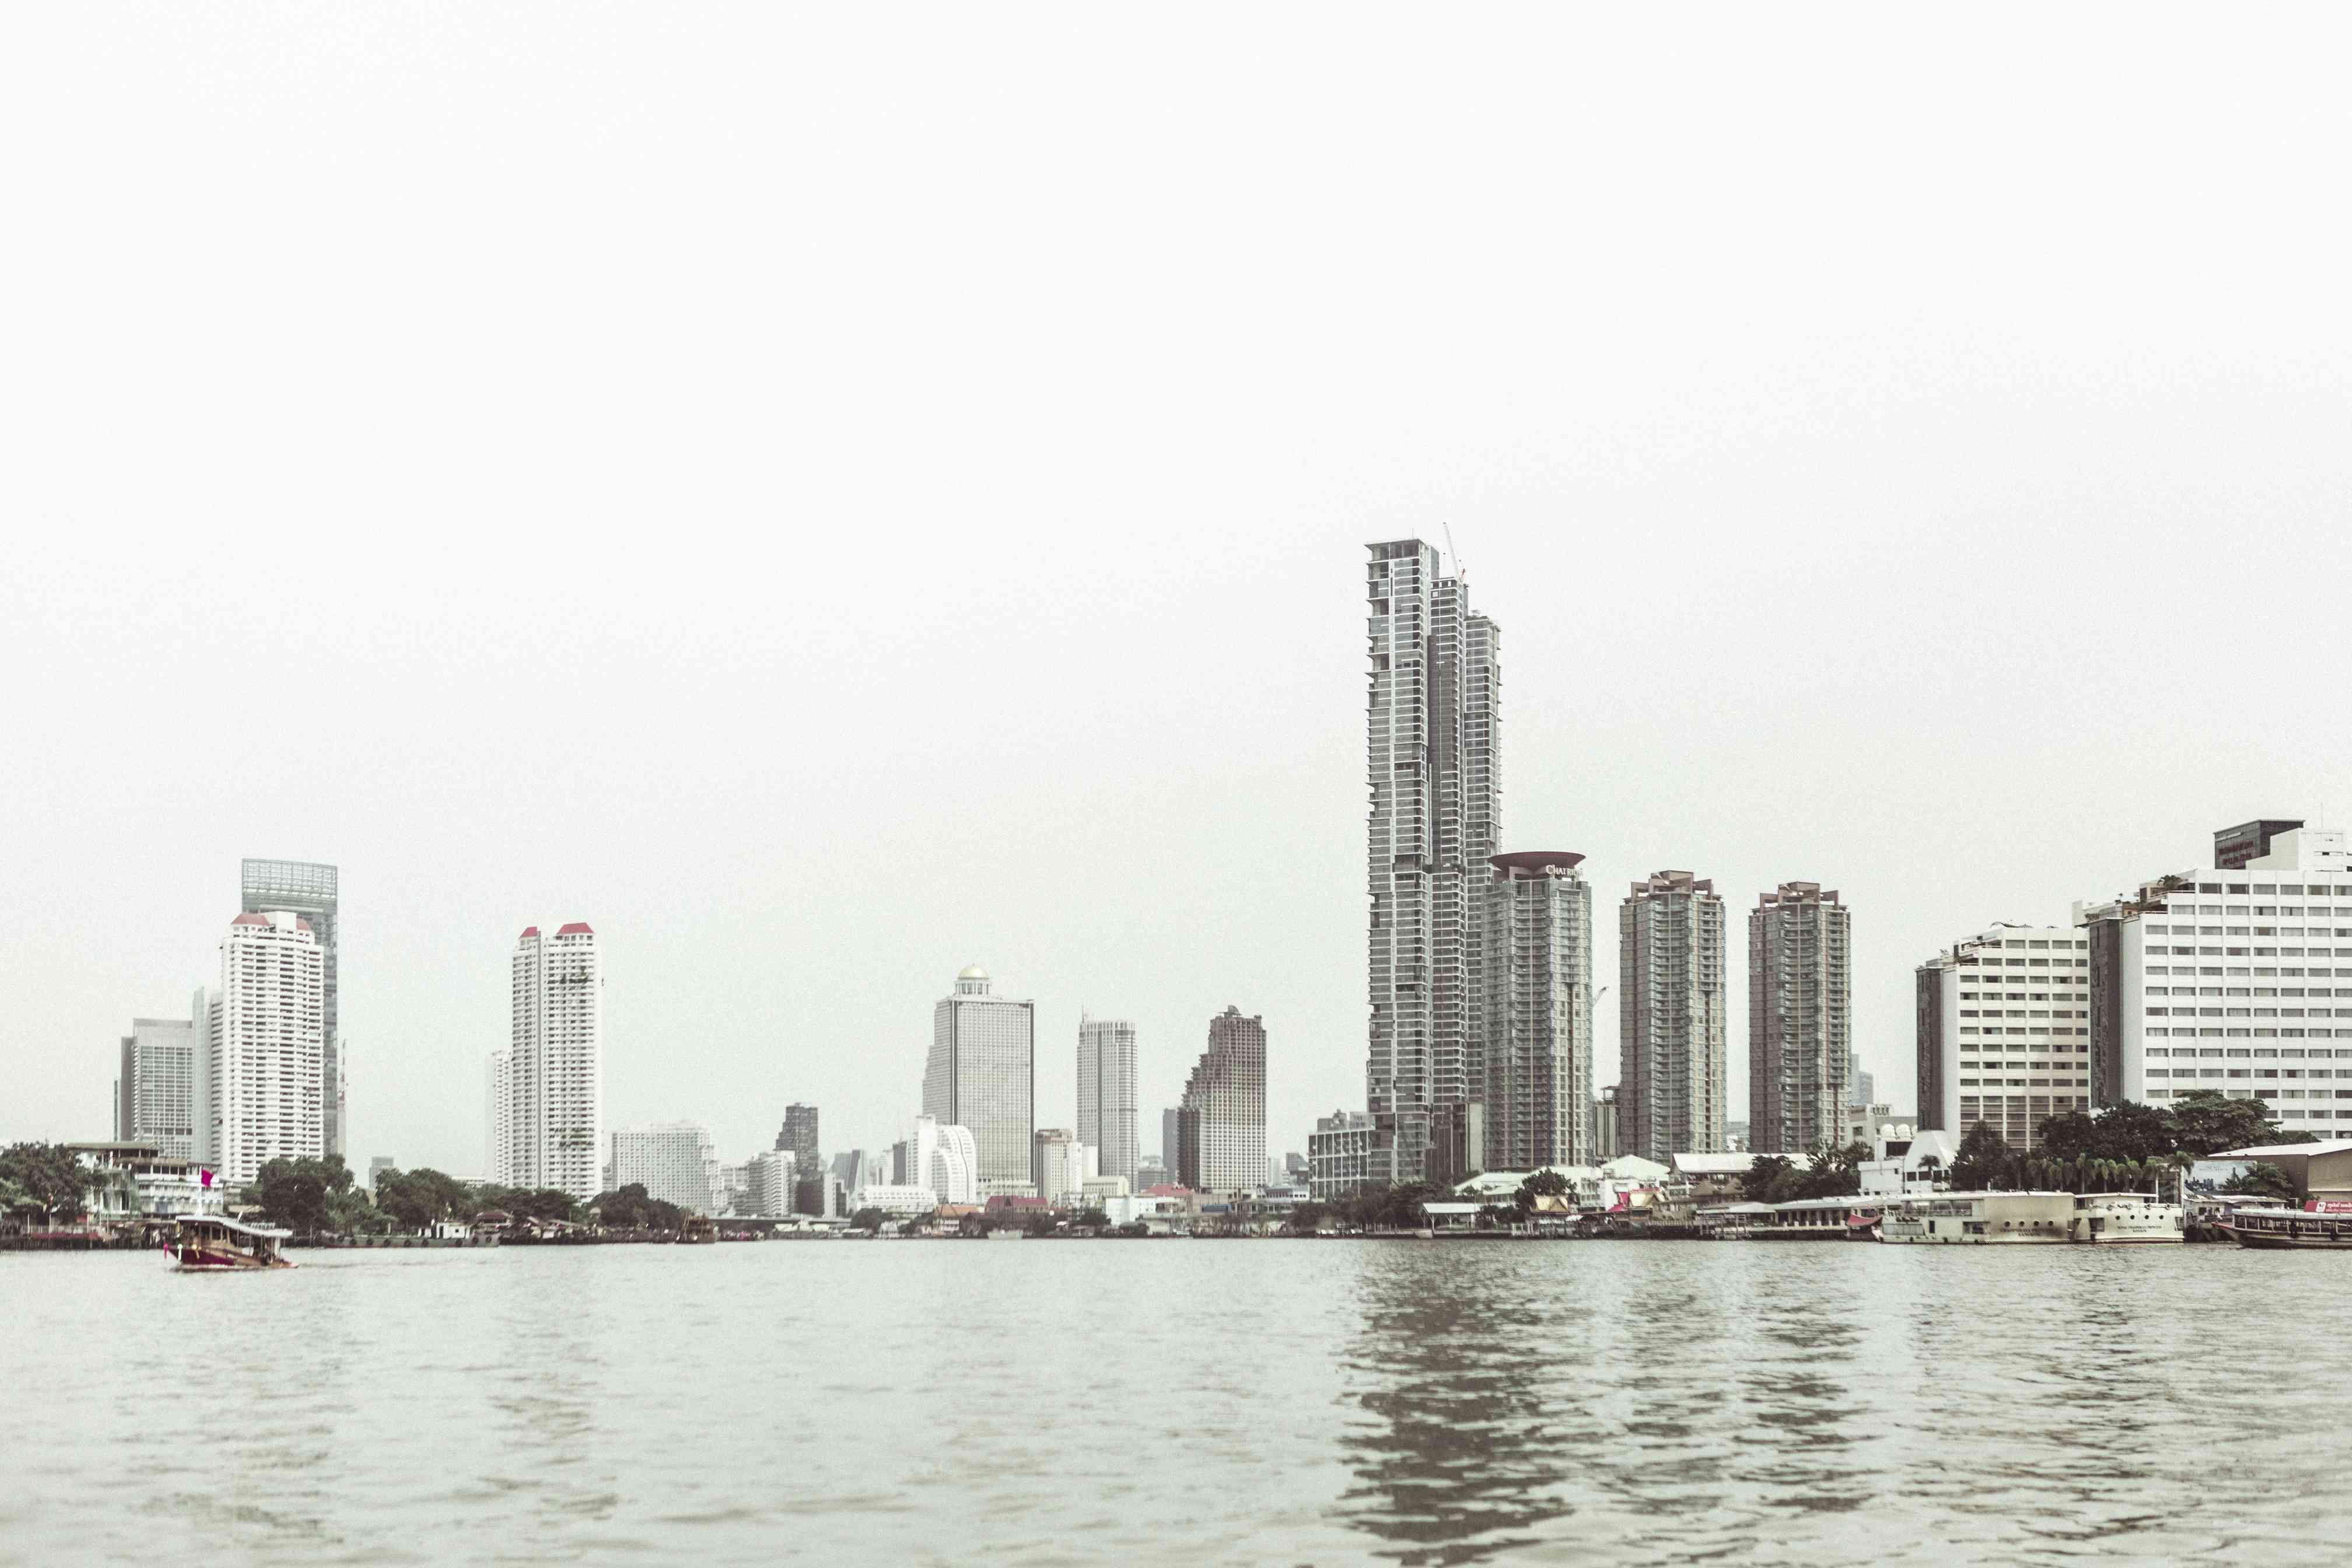 Bangkok skyline from the river